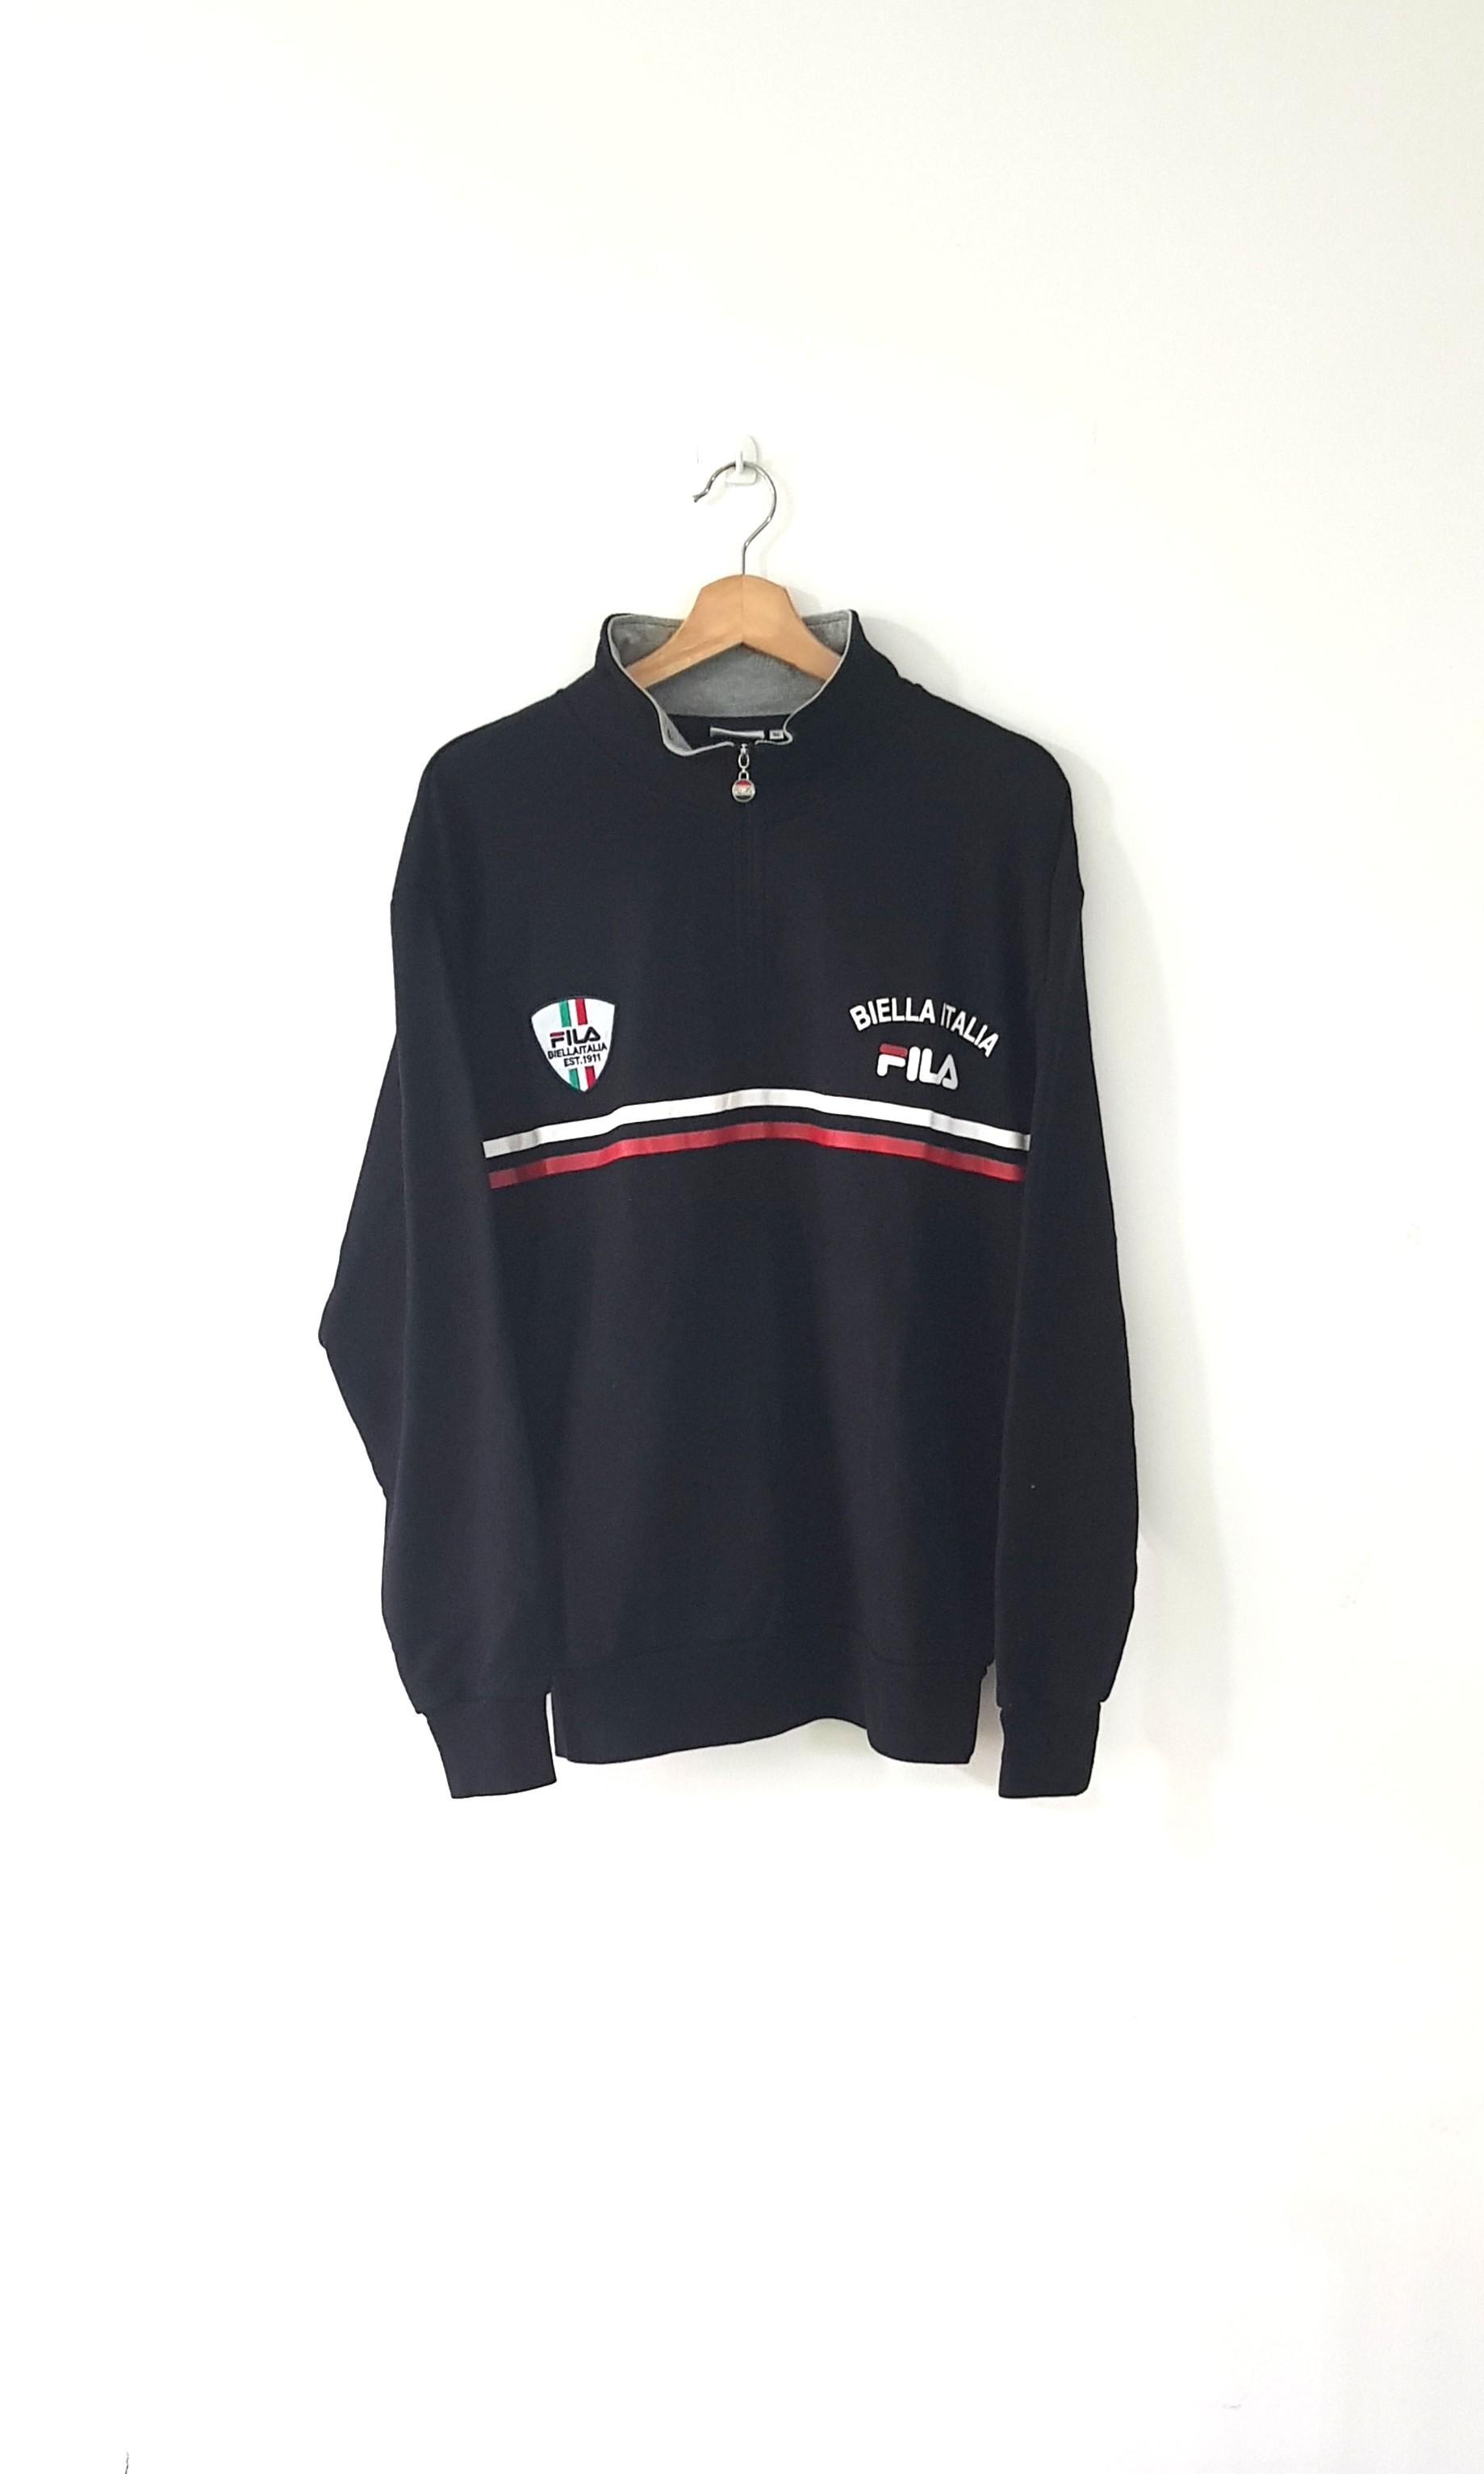 0e259930c4d1 Vintage Fila Half Zip Sweatshirt, Men's Fashion, Clothes, Tops on ...